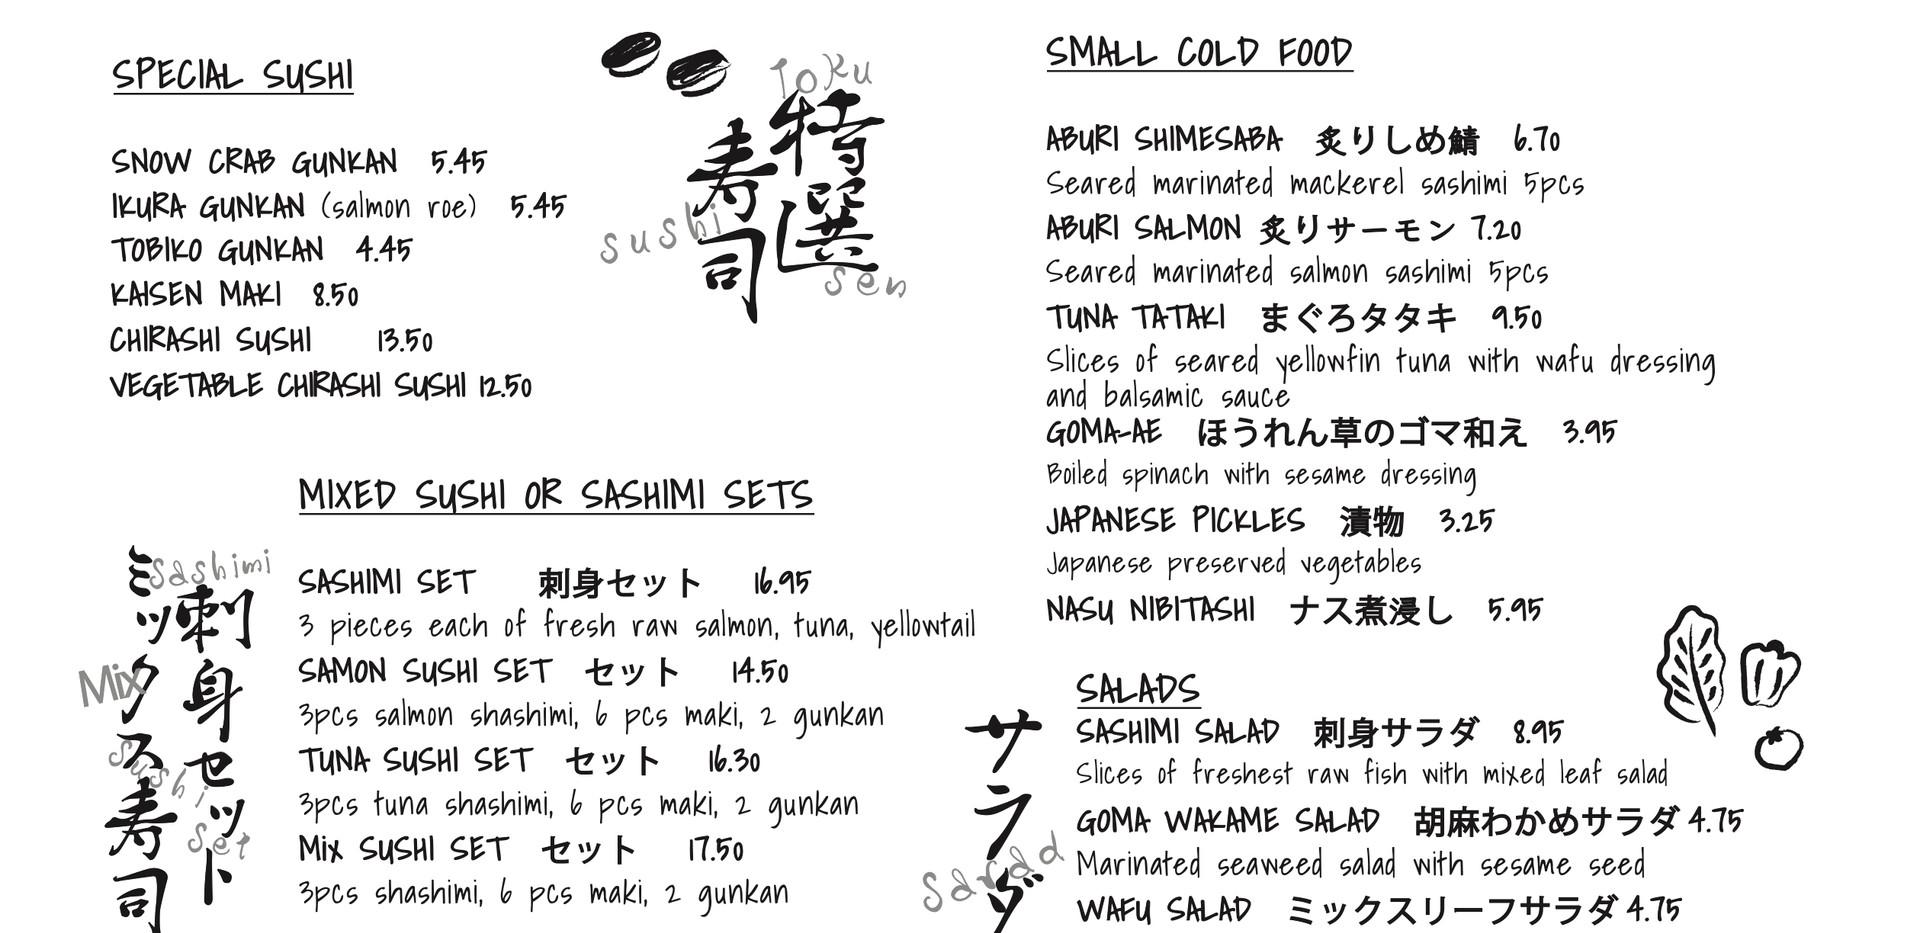 Tenshi Menu July 20202.jpg